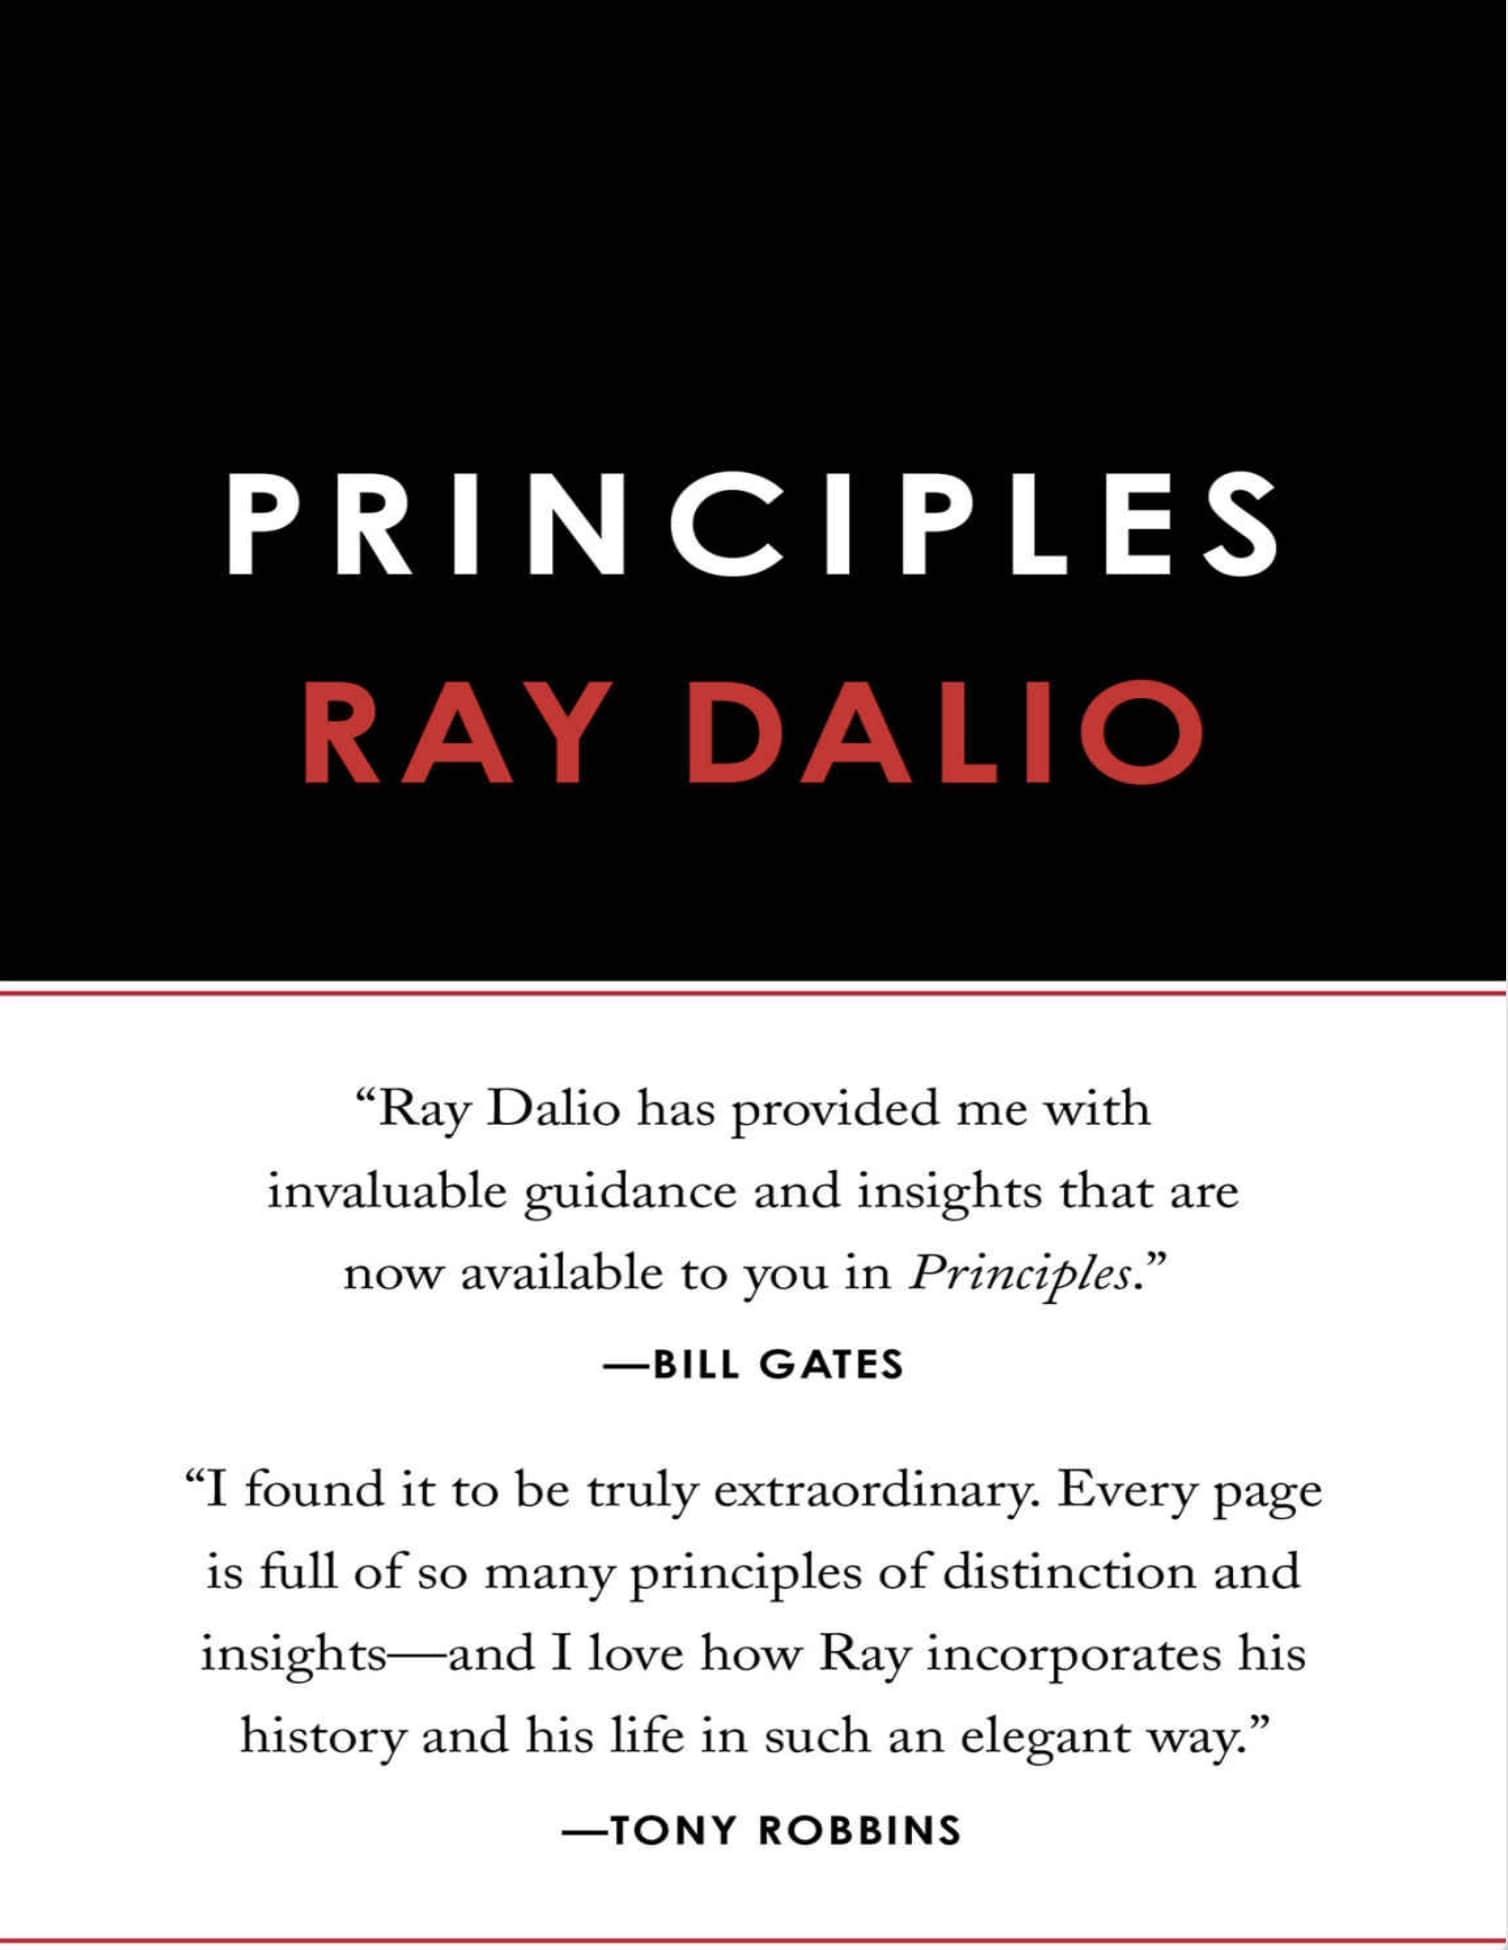 Ray Dario